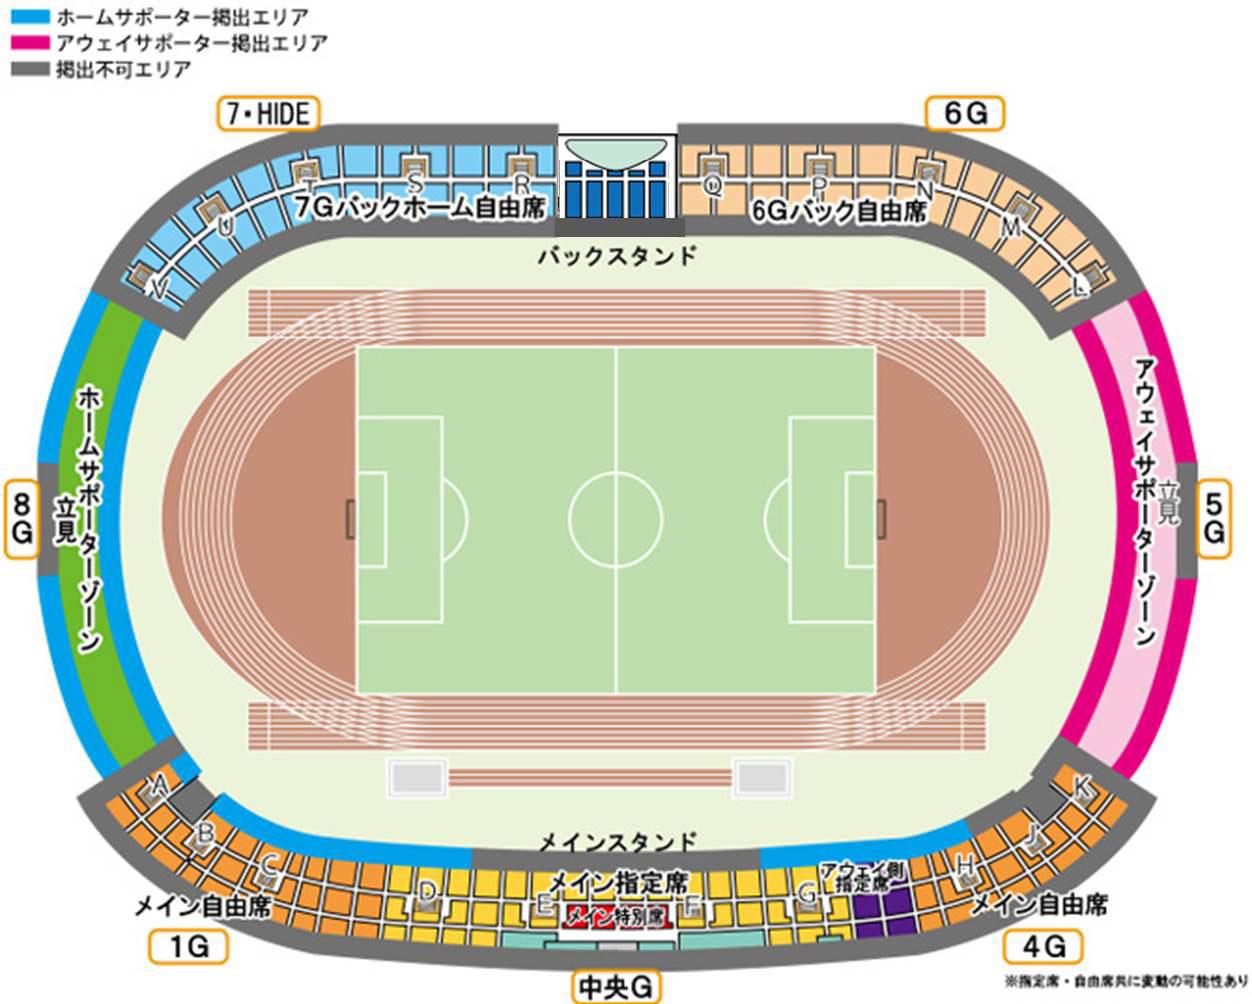 Shonan BMW スタジアム平塚案内図